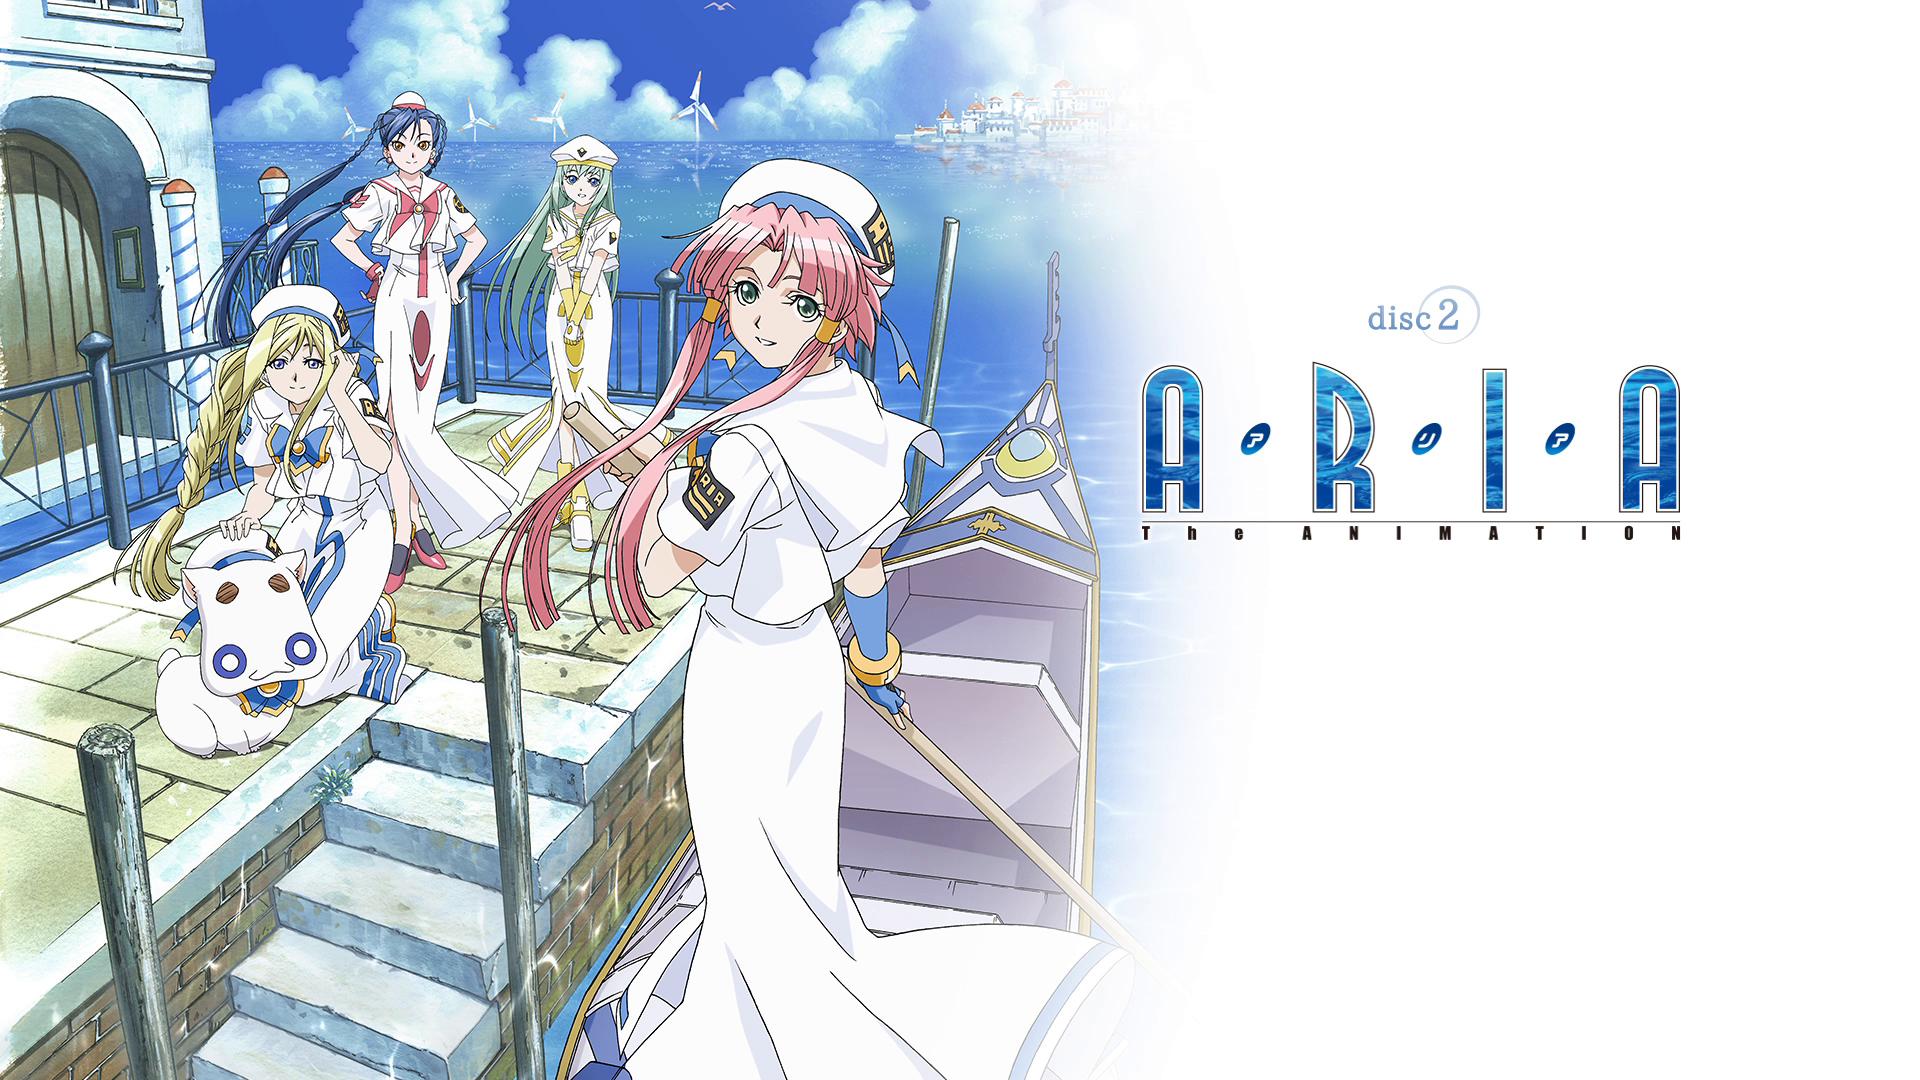 [ReinForce] Aria the Avvenire - OVA 1 - 3 (BDRip 1920x1080 x264 FLAC)